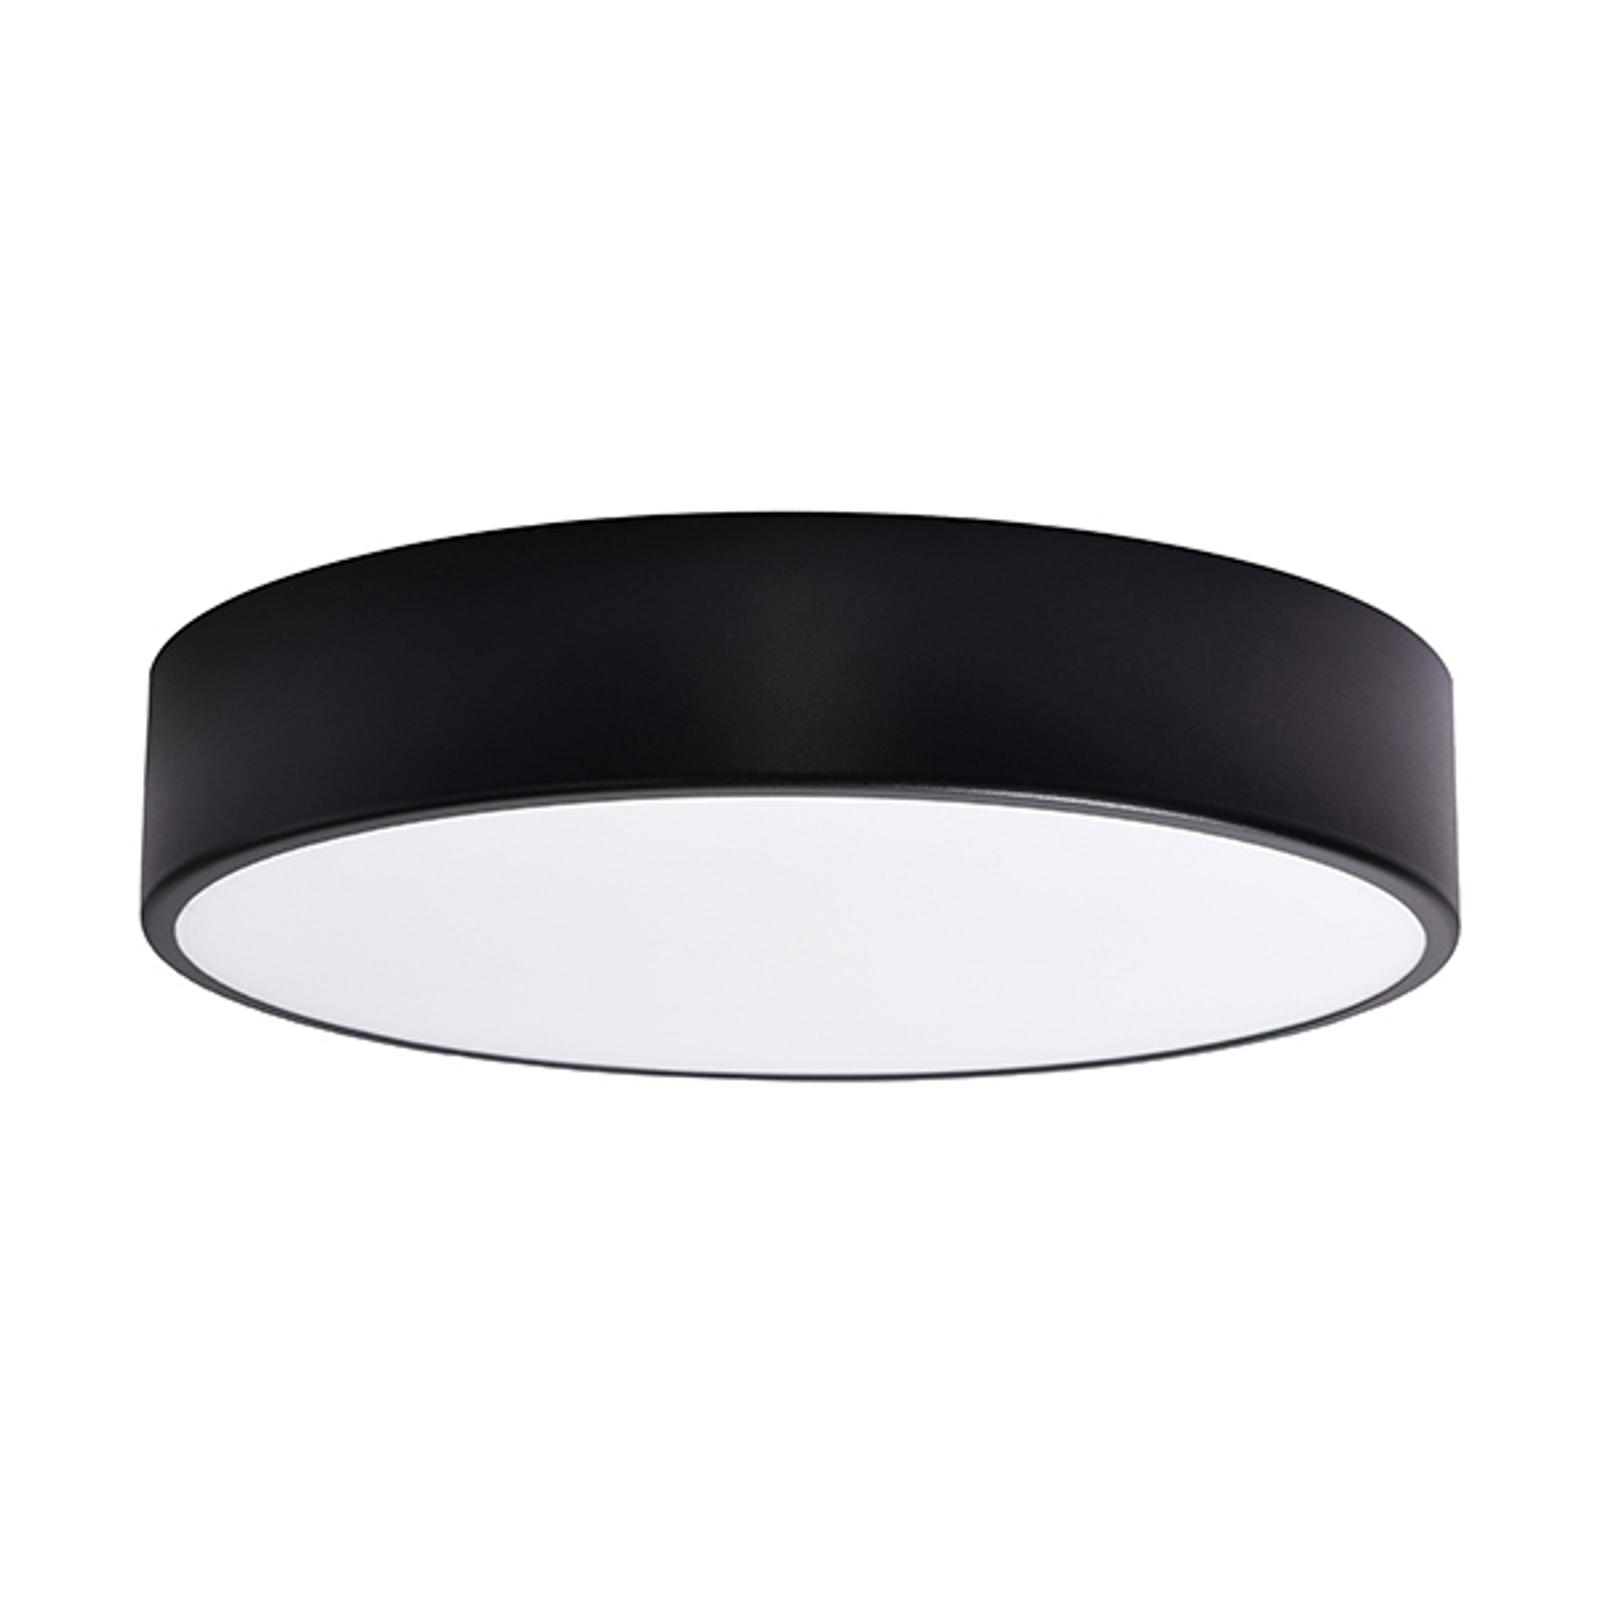 Cleo loftlampe, Ø 40 cm, sort